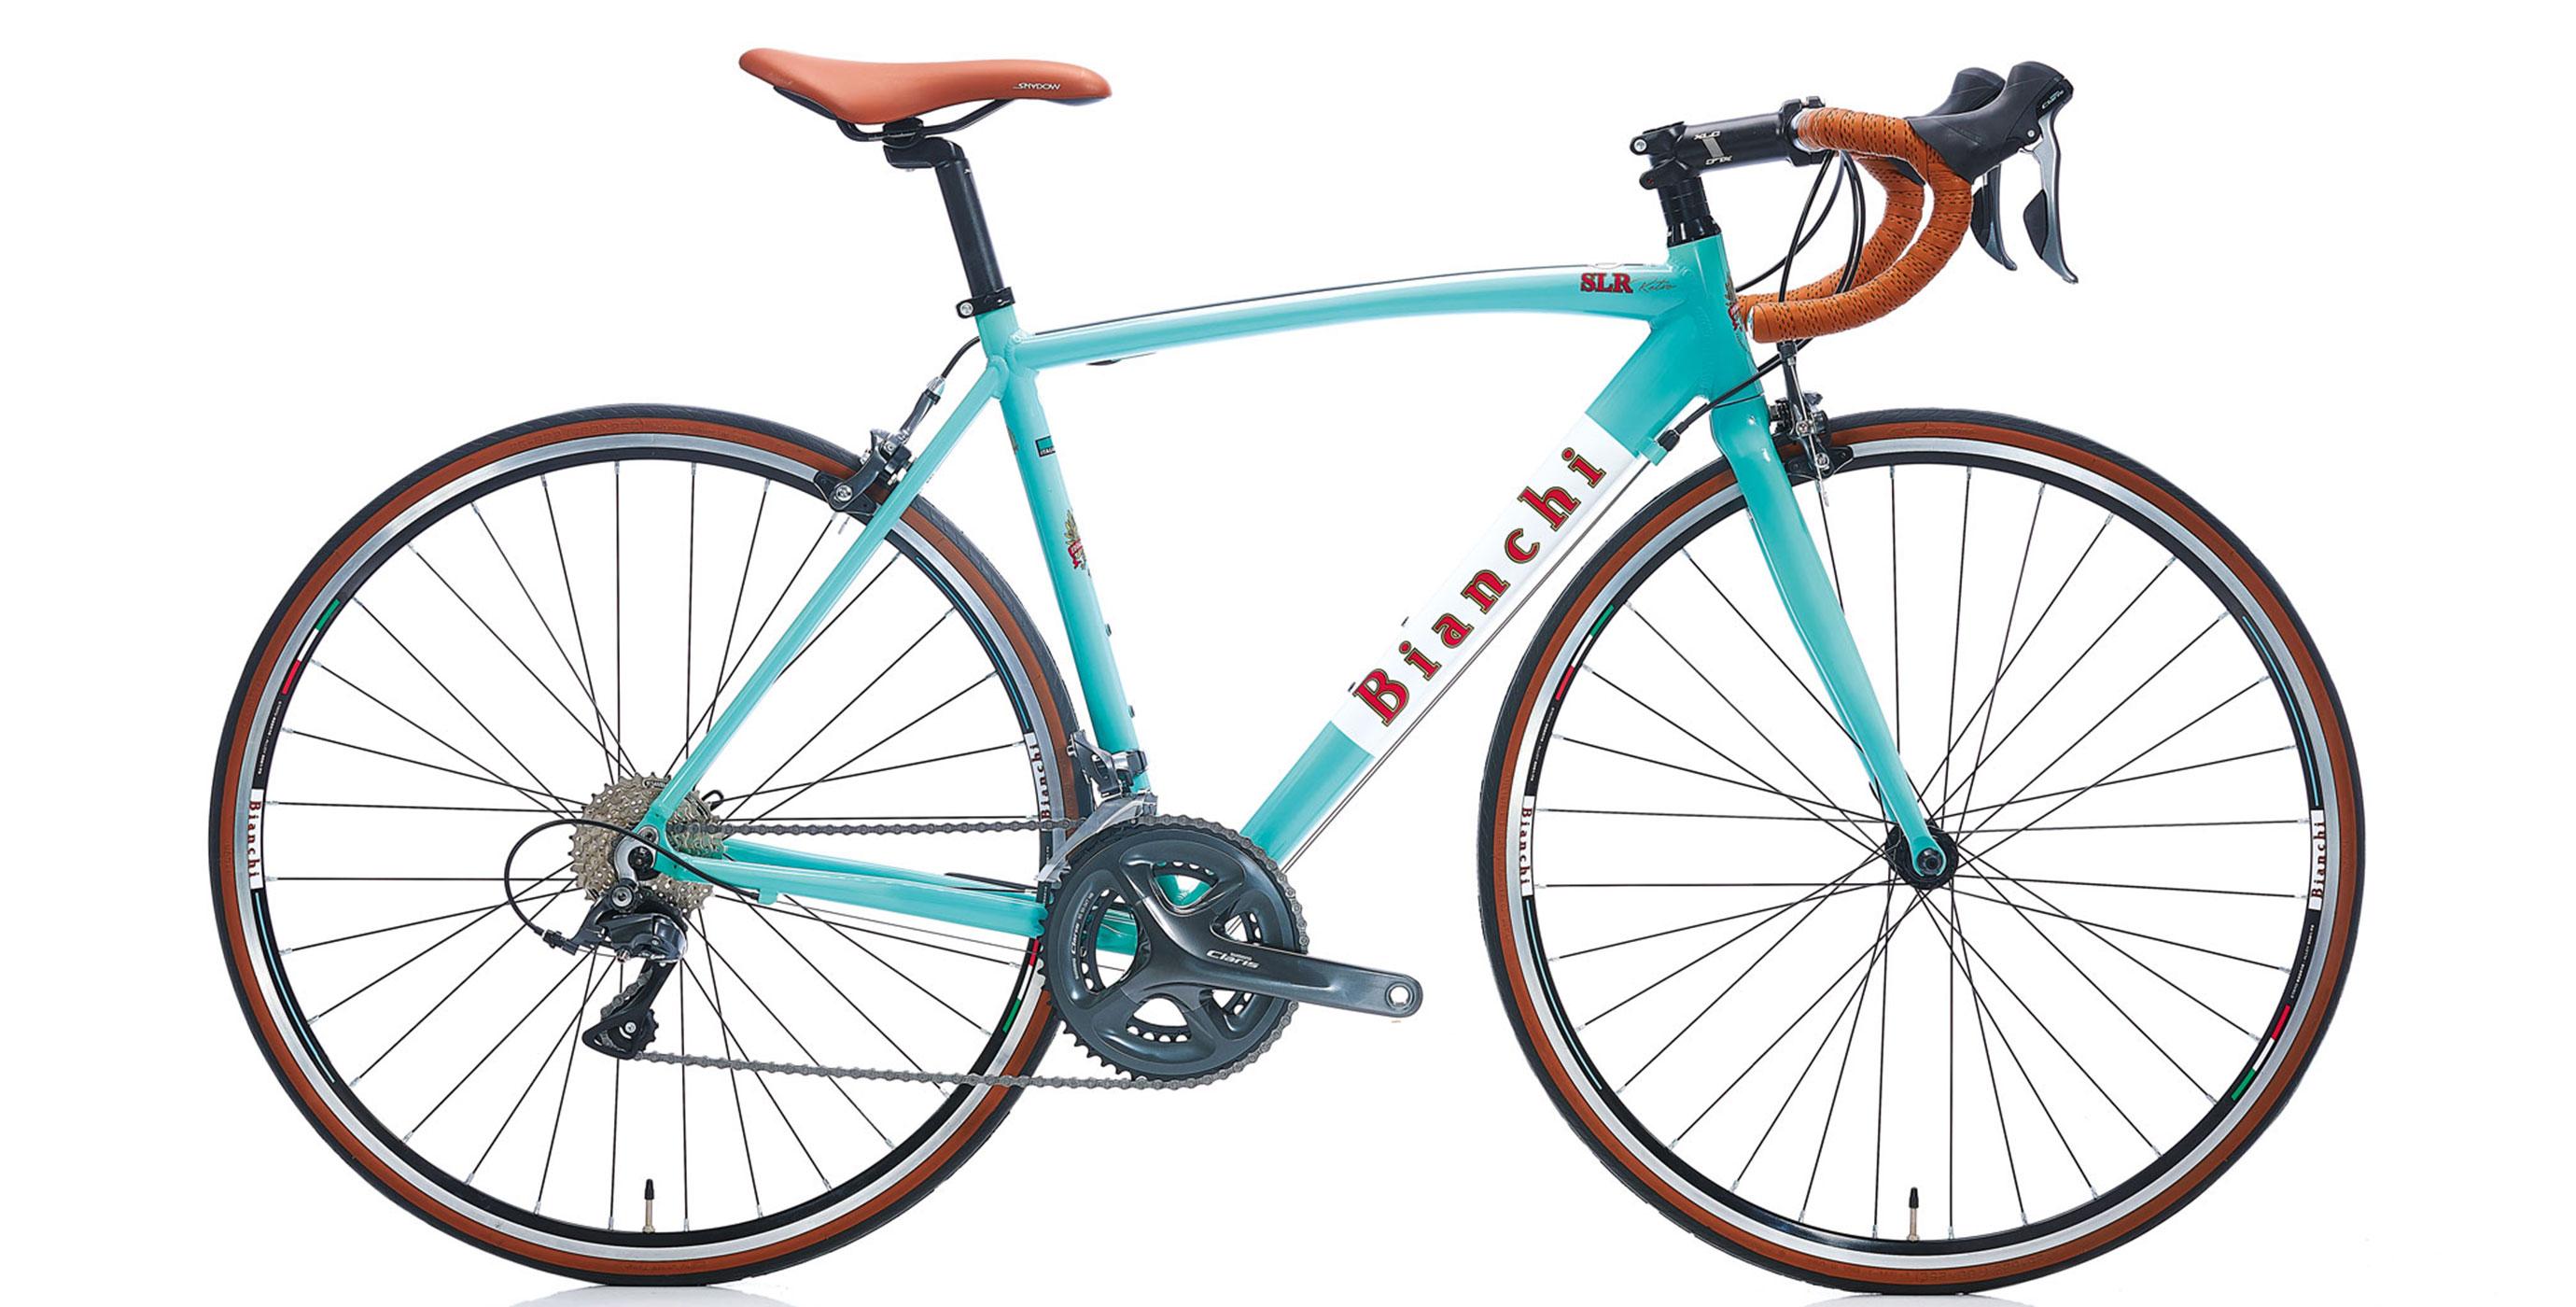 seda bisiklet 1960 tan gunumuze